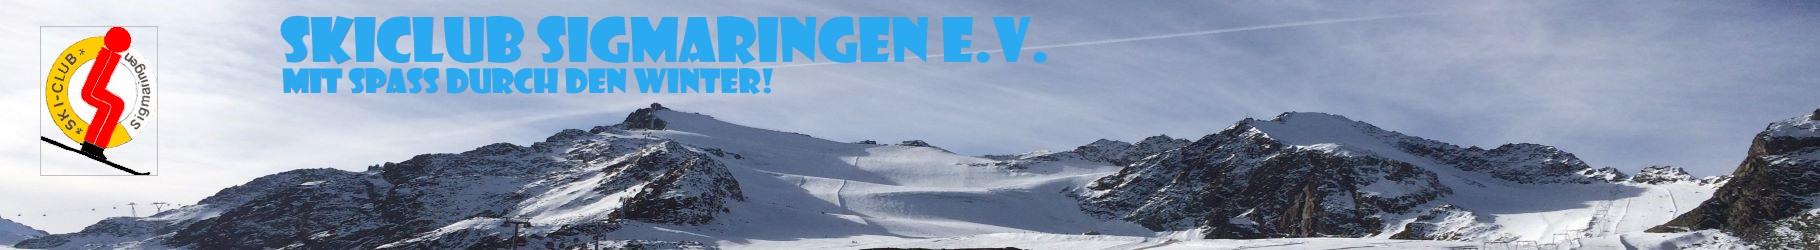 Skiclub-Sigmaringen